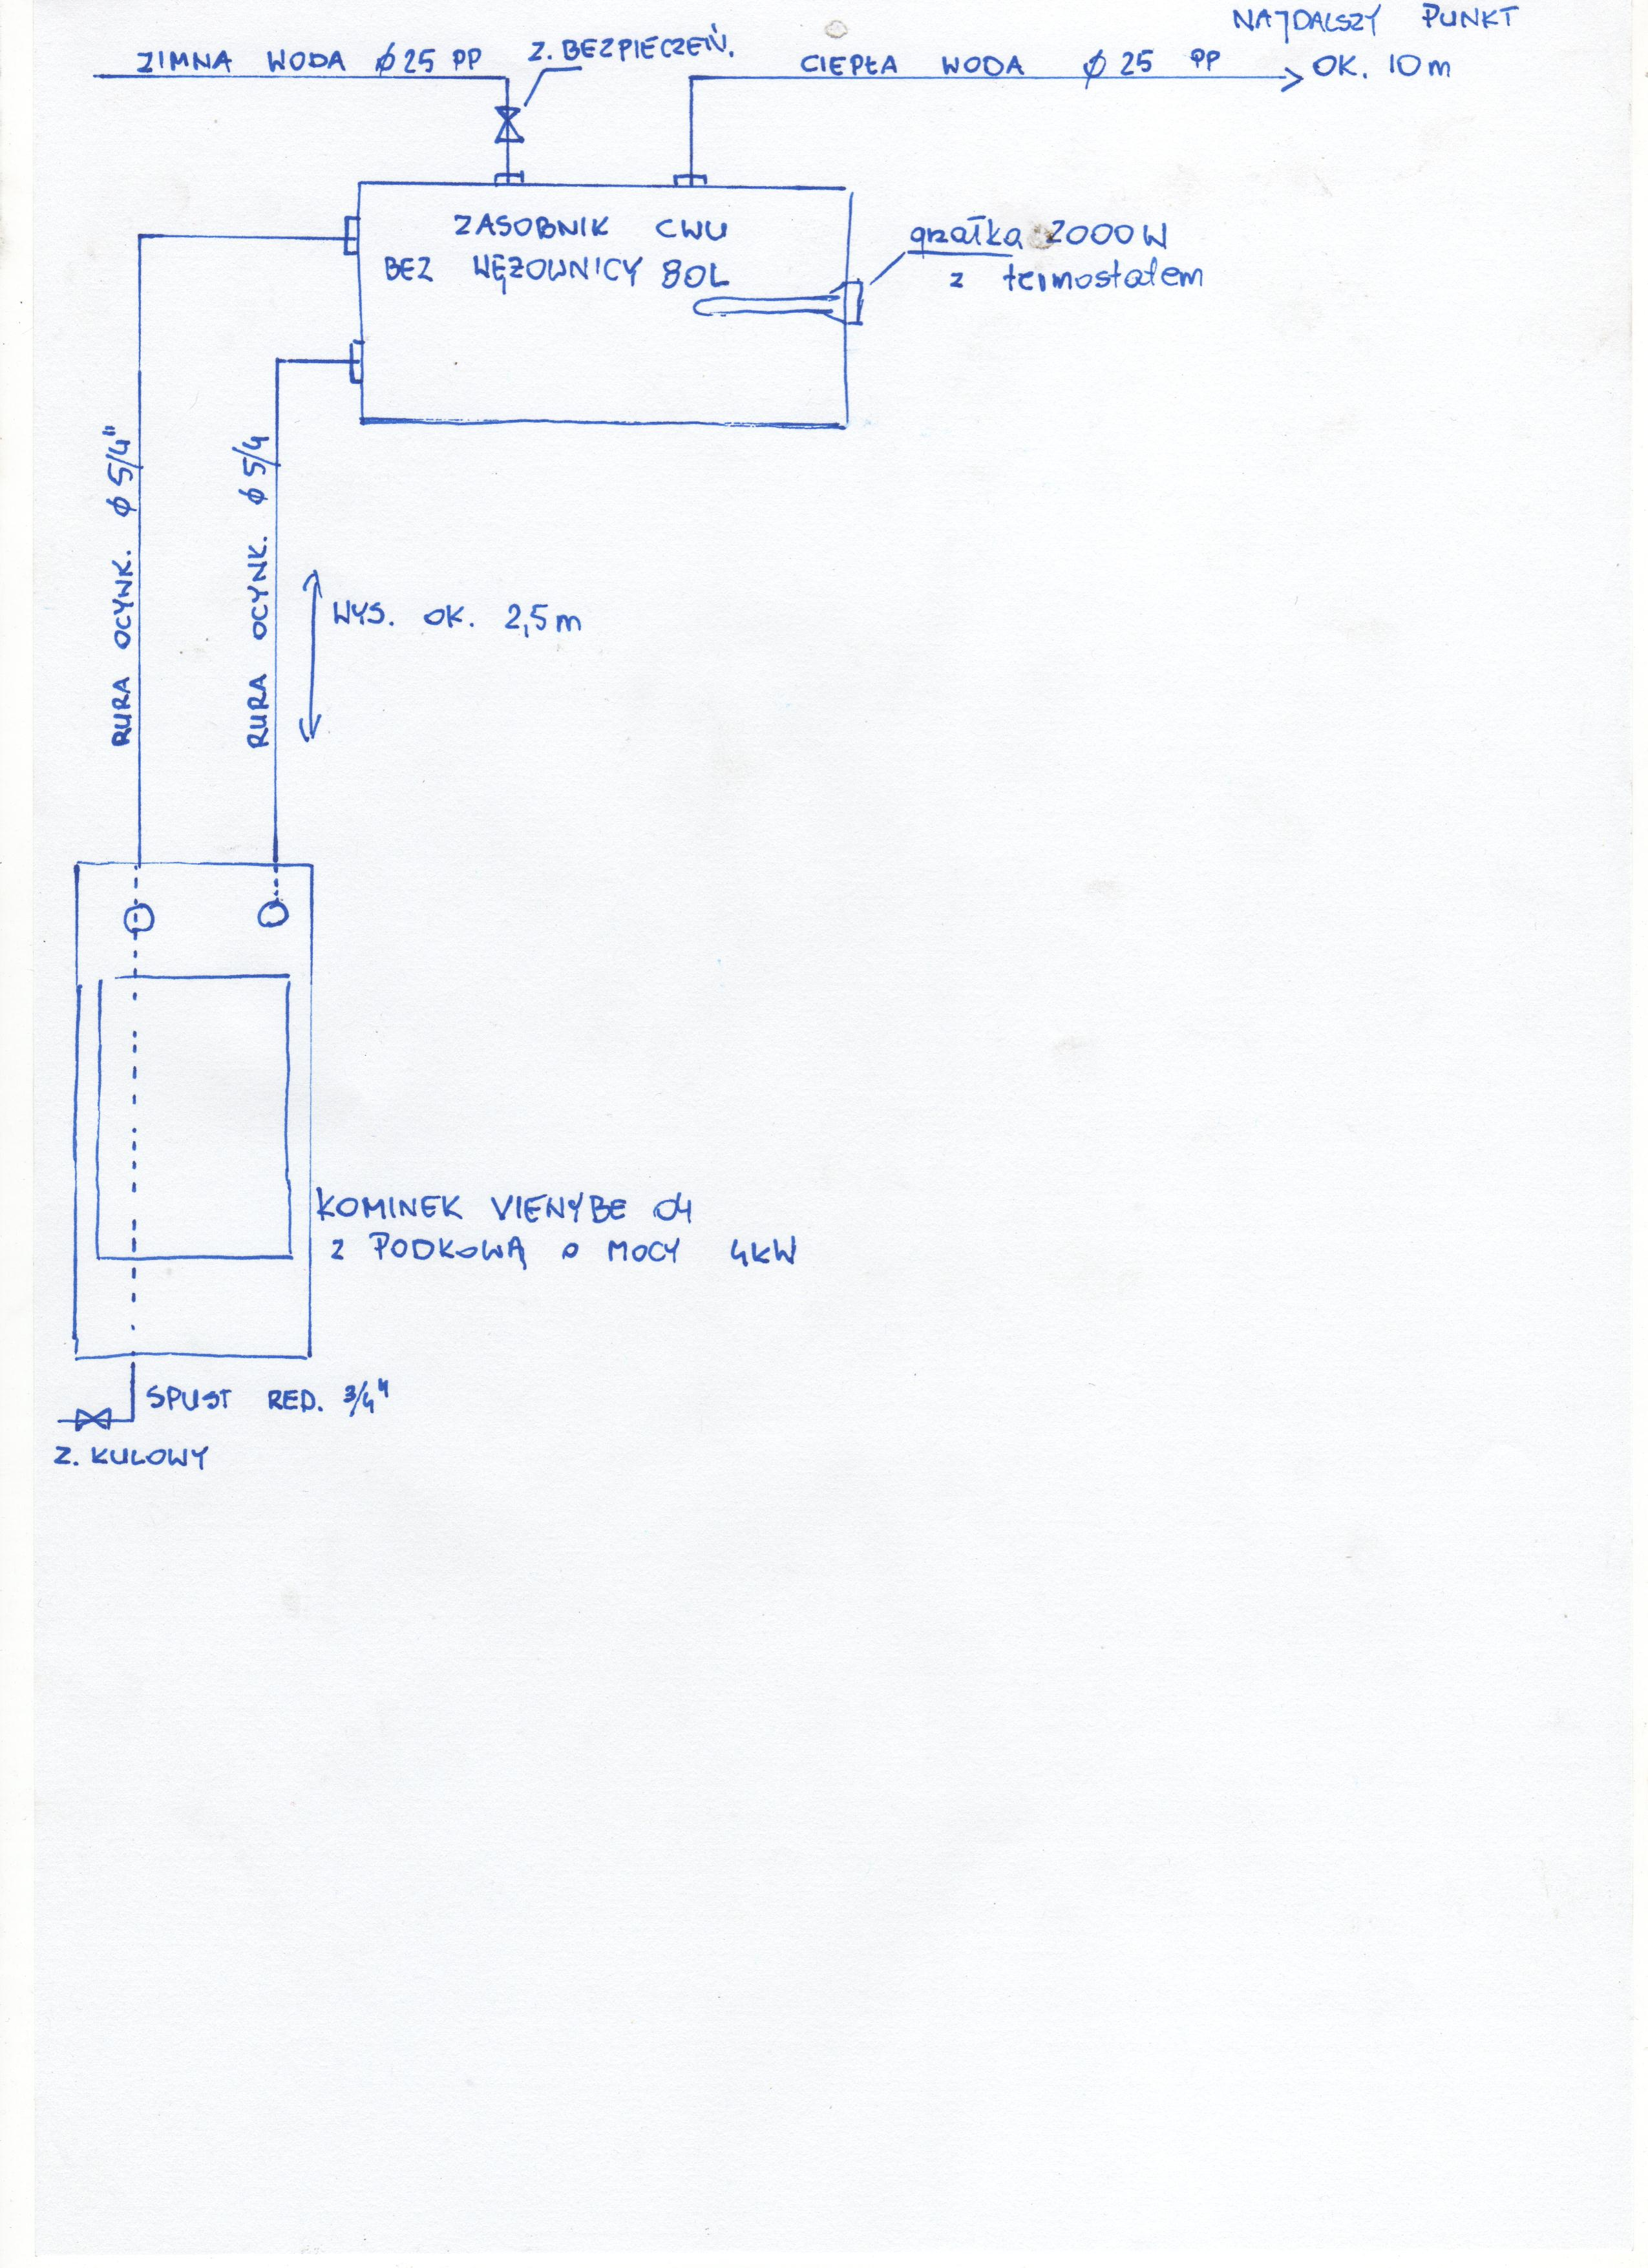 Kominek Vienybe 04 z podkow�  - Pro�ba o projekt instalacji